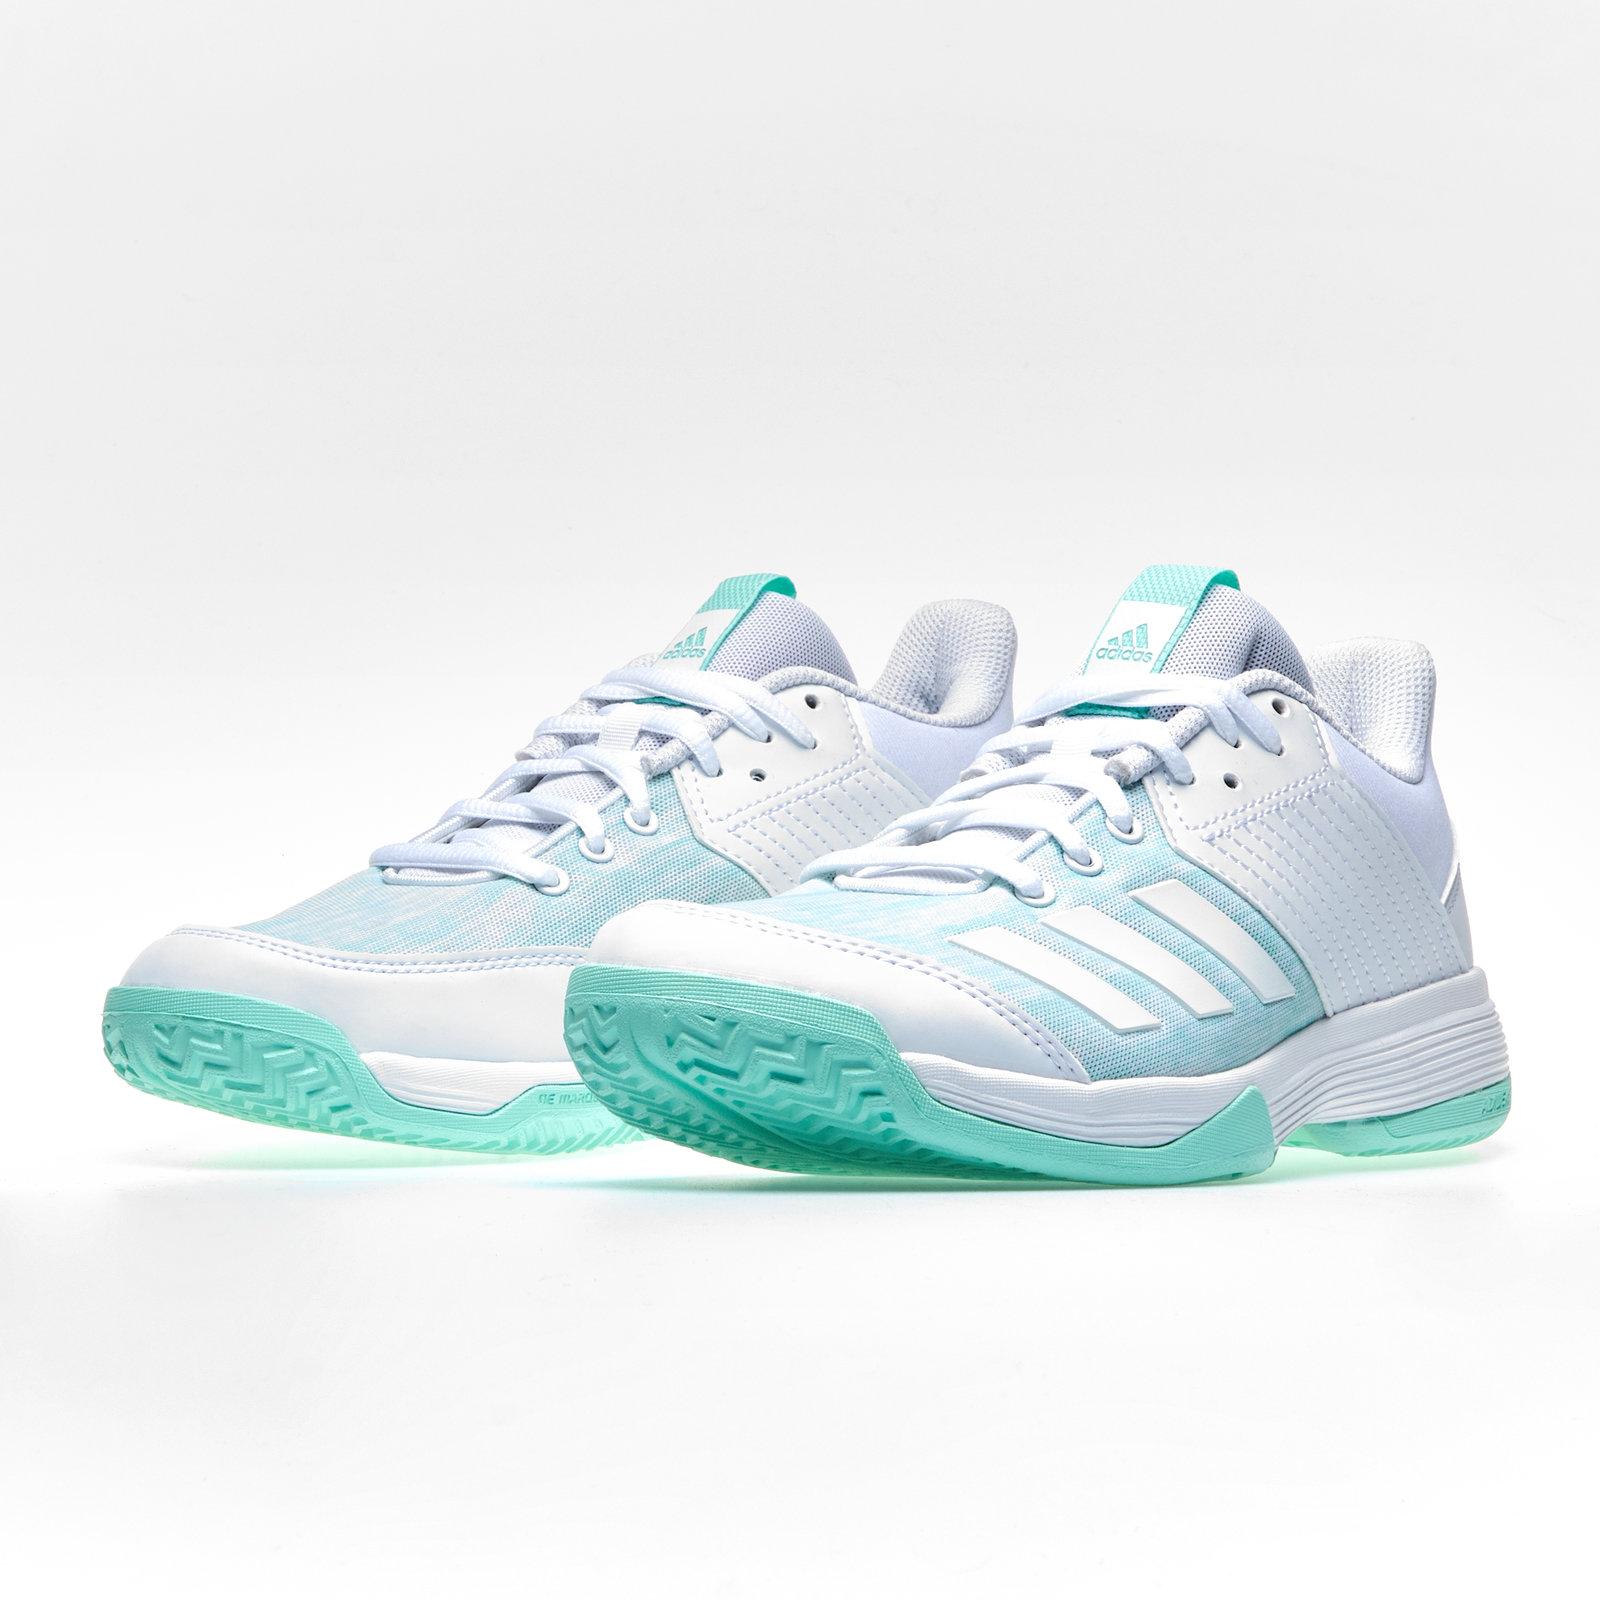 adidas netball shoes| flash sales |www